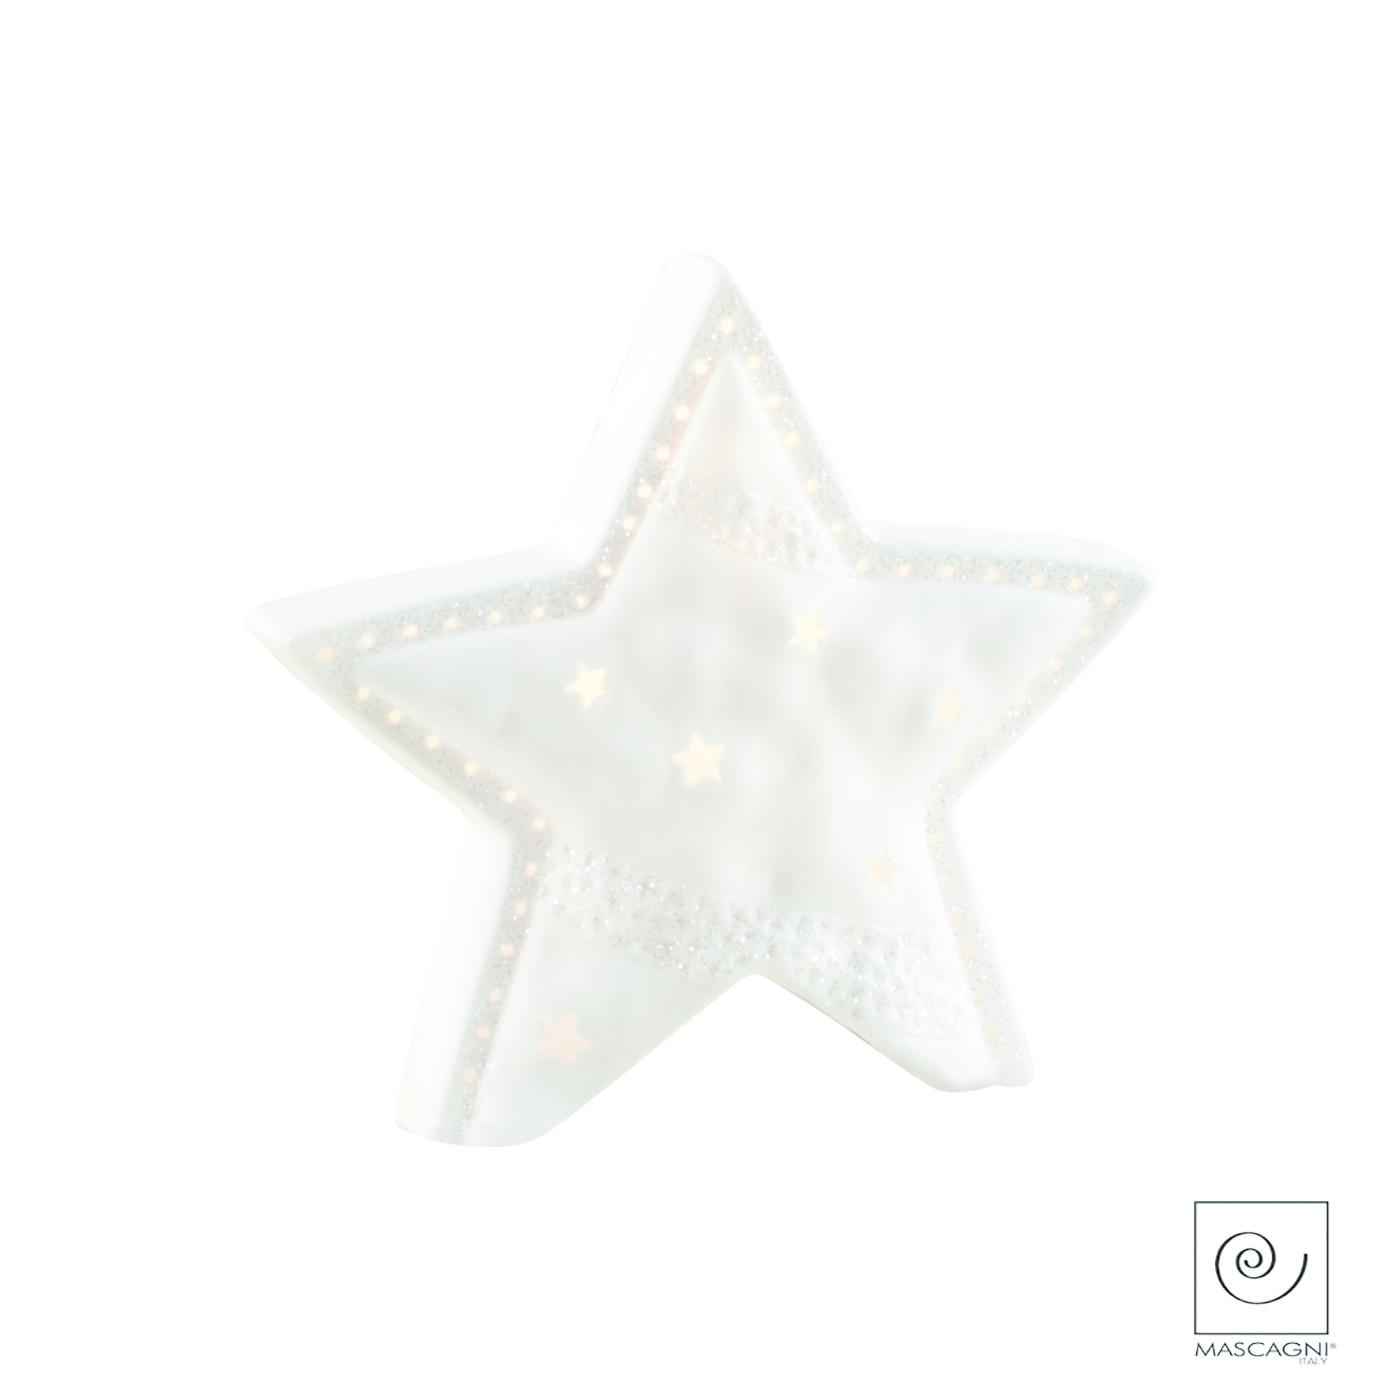 Art Mascagni LED STAR CM.17,5